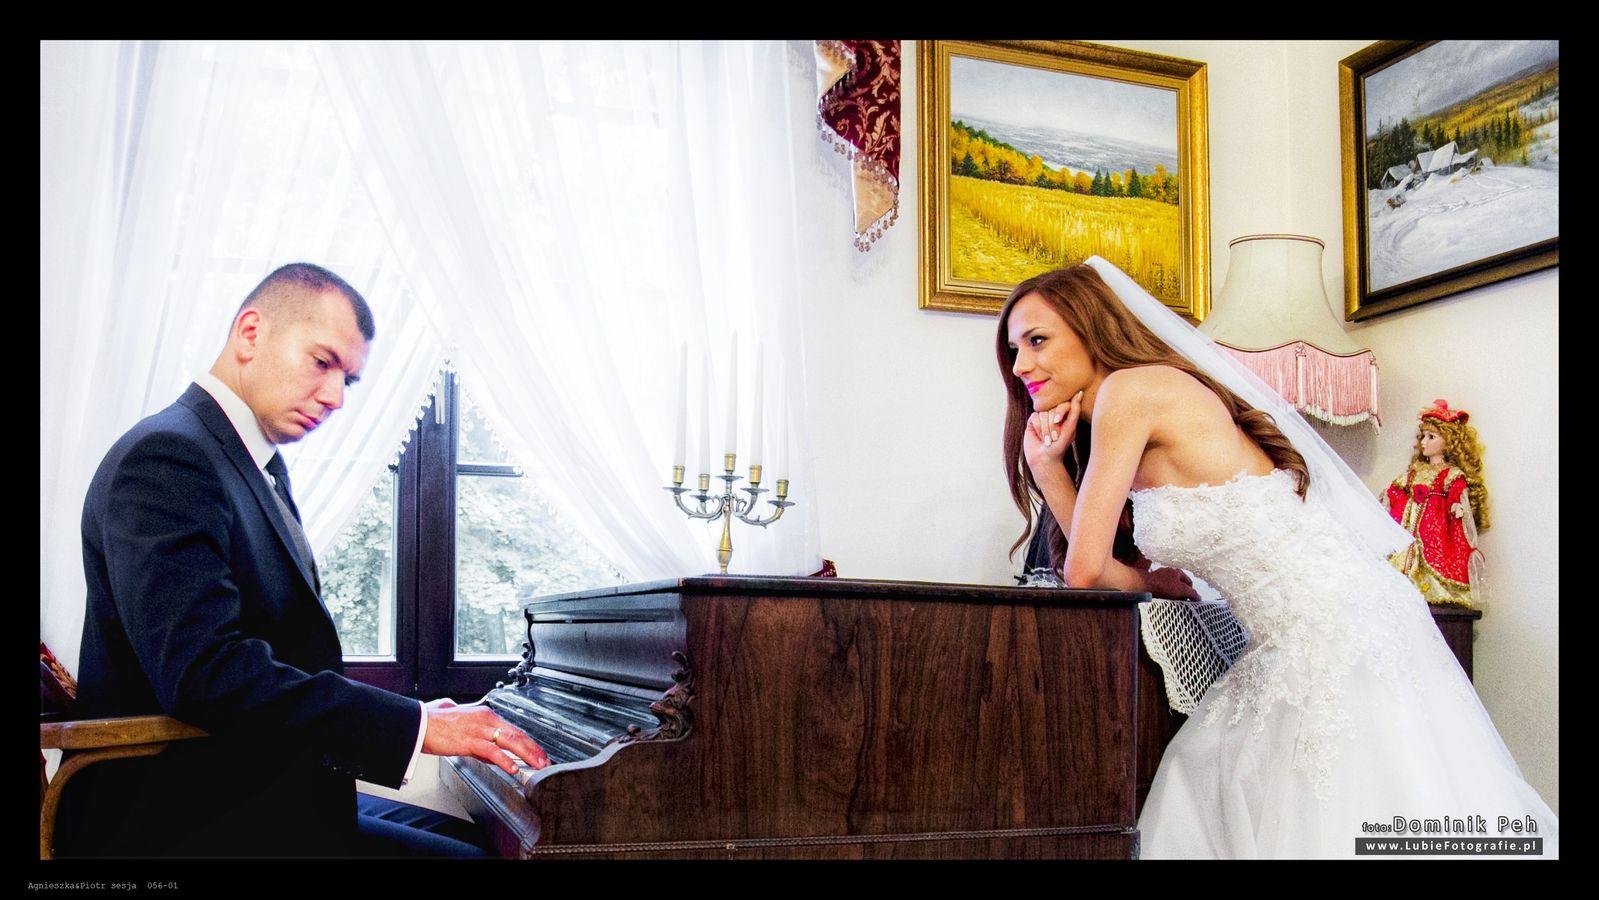 Agnieszka&Piotr  0087